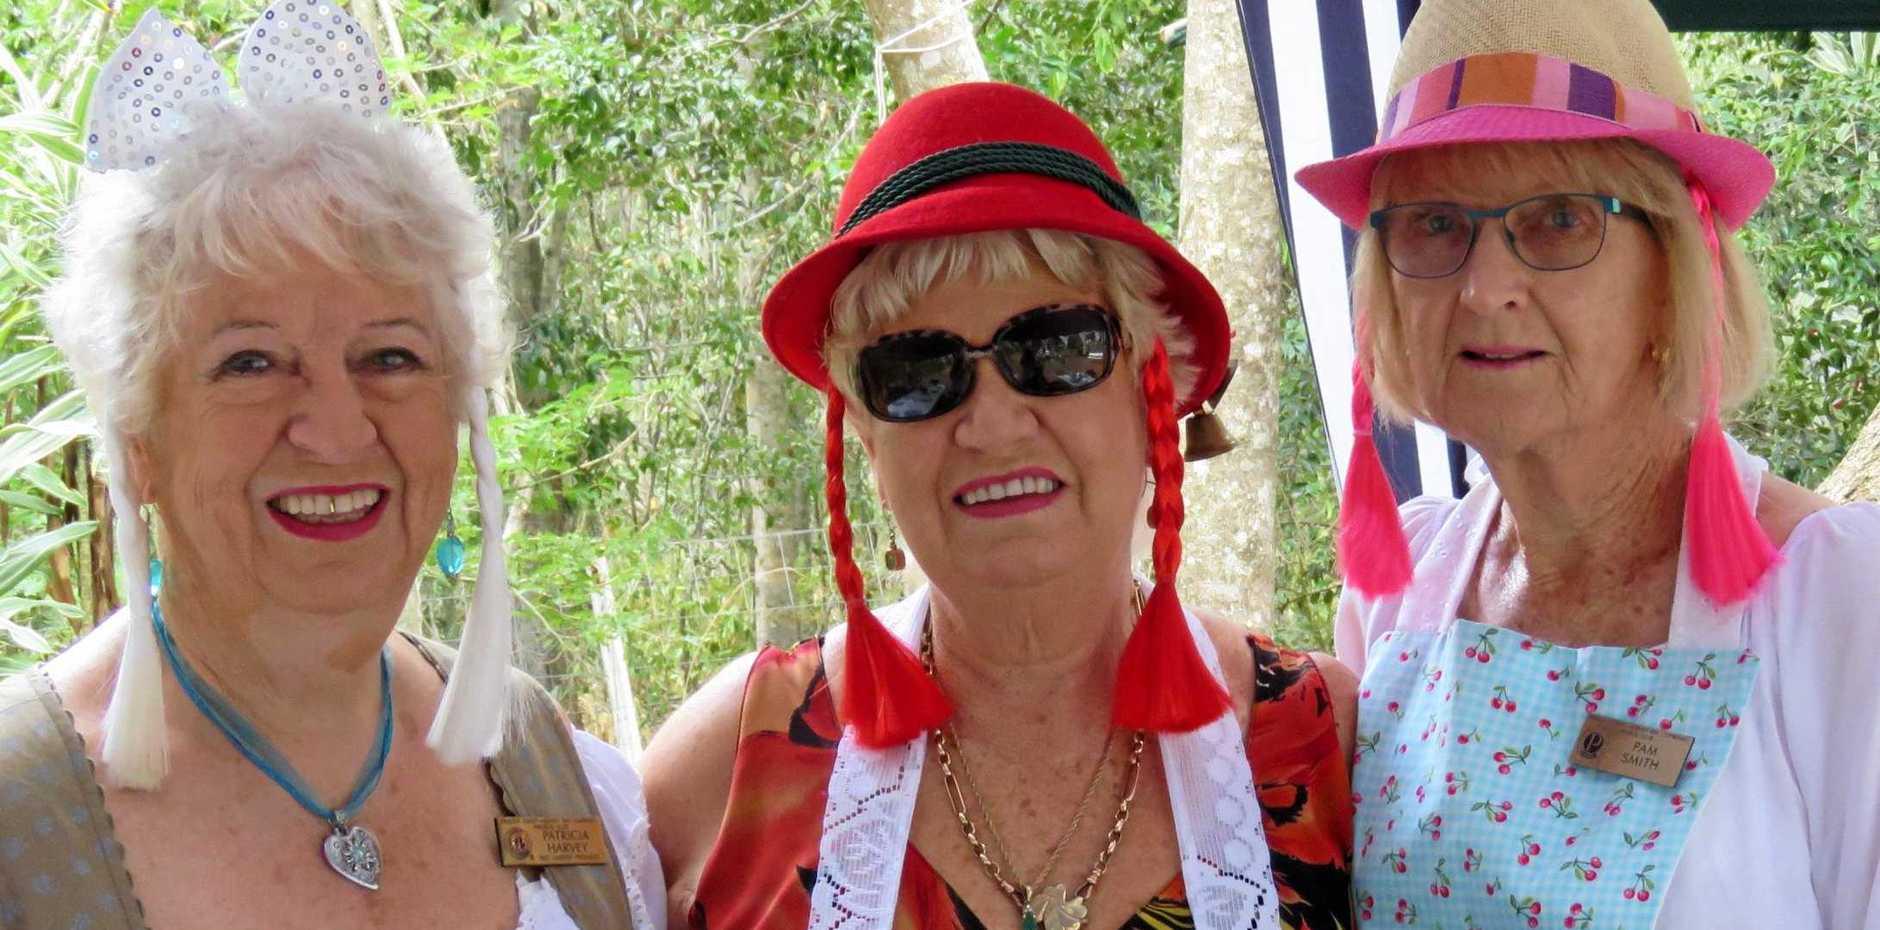 Fraser Coast-Hervey Bay Combined Probus club members Pat Harvey, Gay Ignatenka and Pam Smith joined in on the Oktoberfest Celebrations.